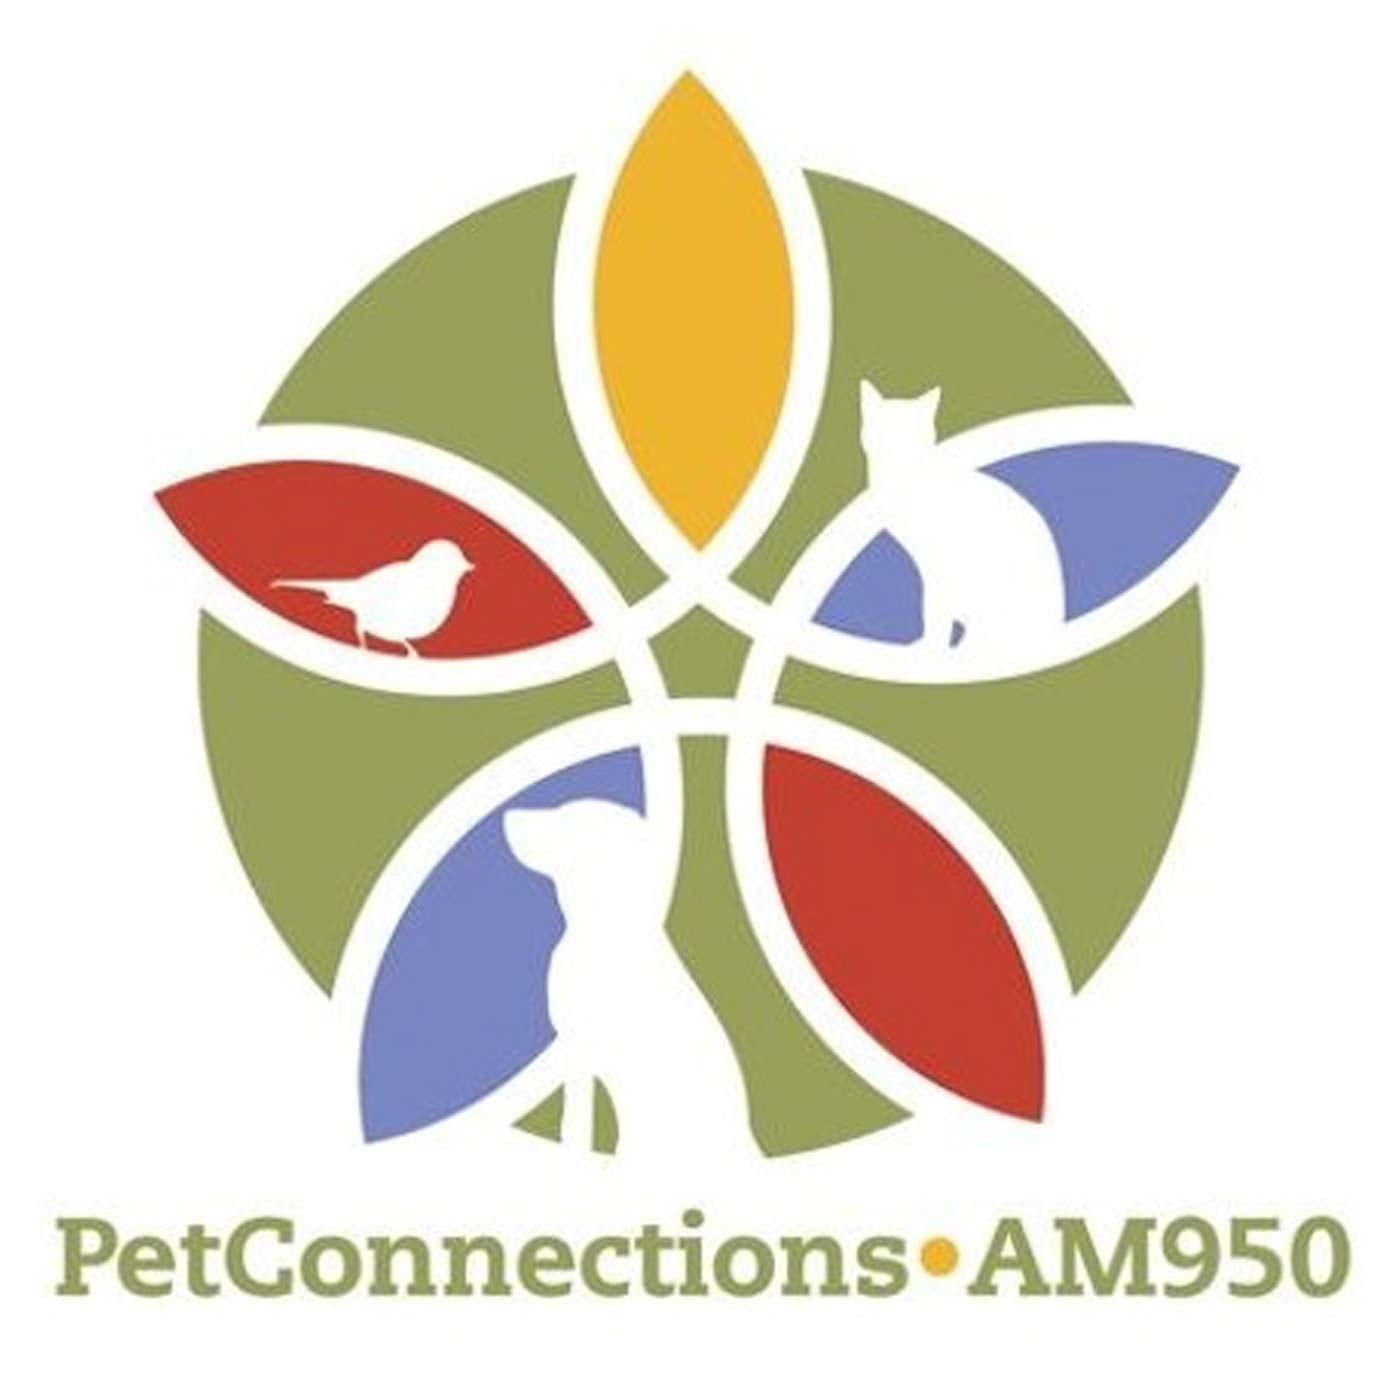 Pet Connections - AM950 The Progressive Voice of Minnesota